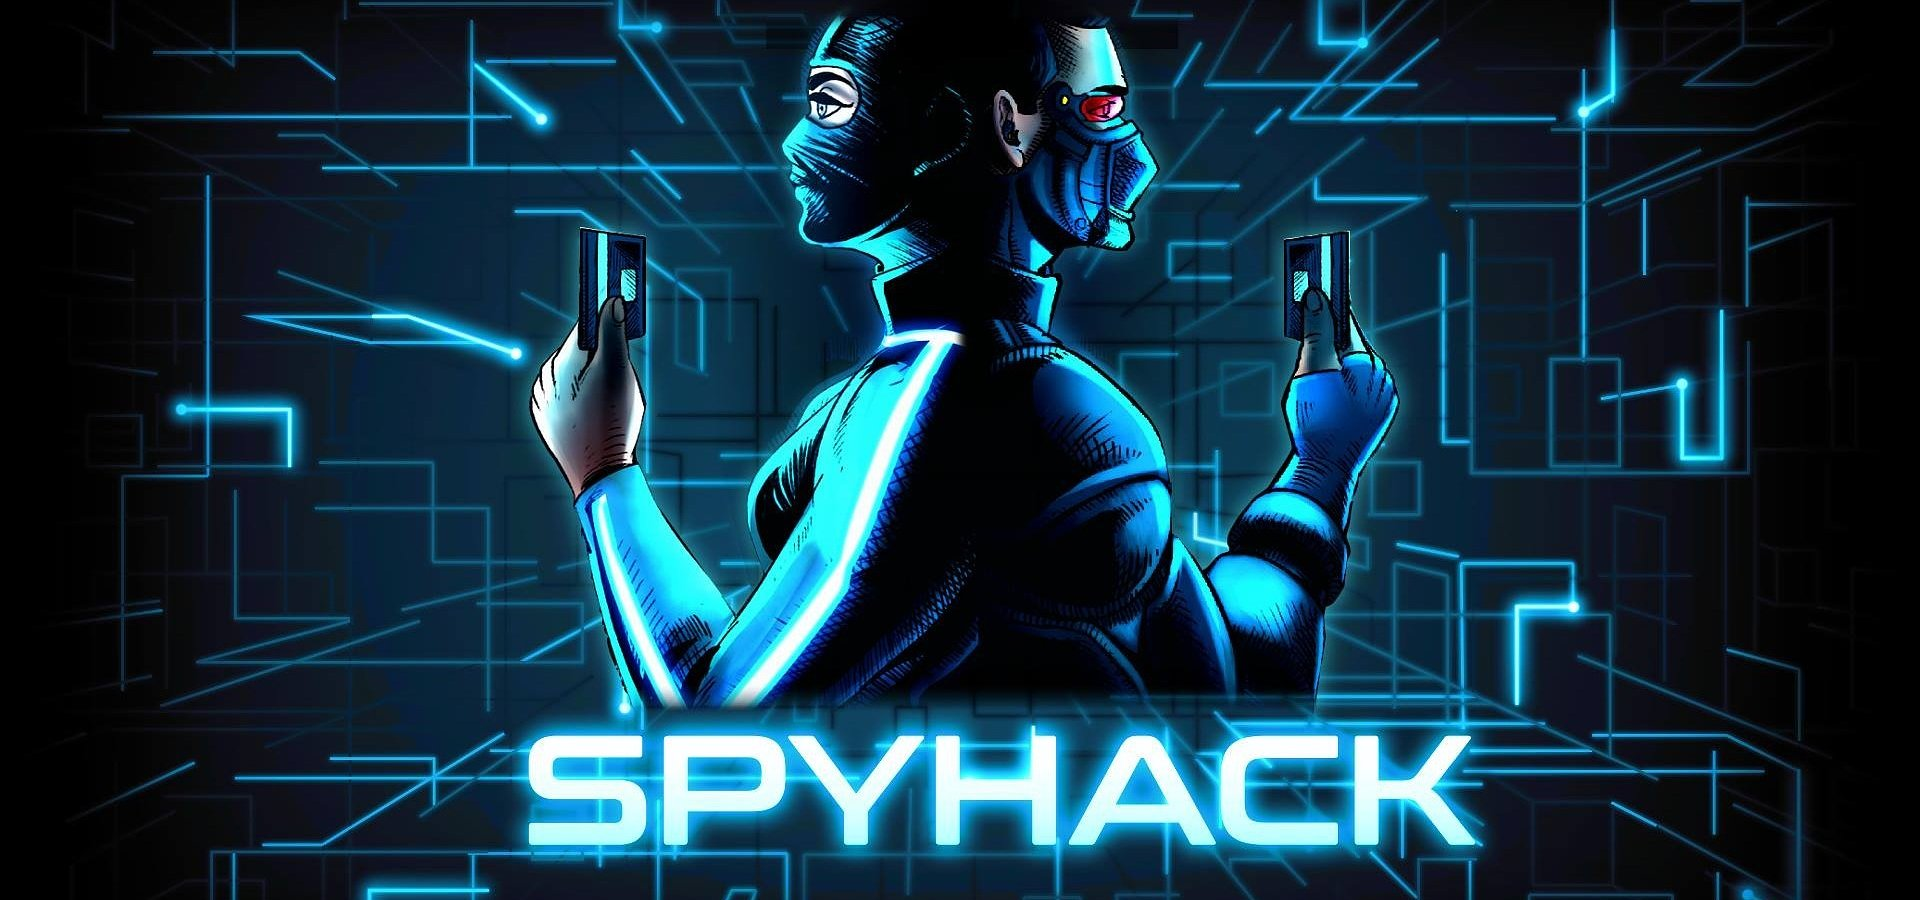 Premiera SpyHack: Episode 1 już dziś